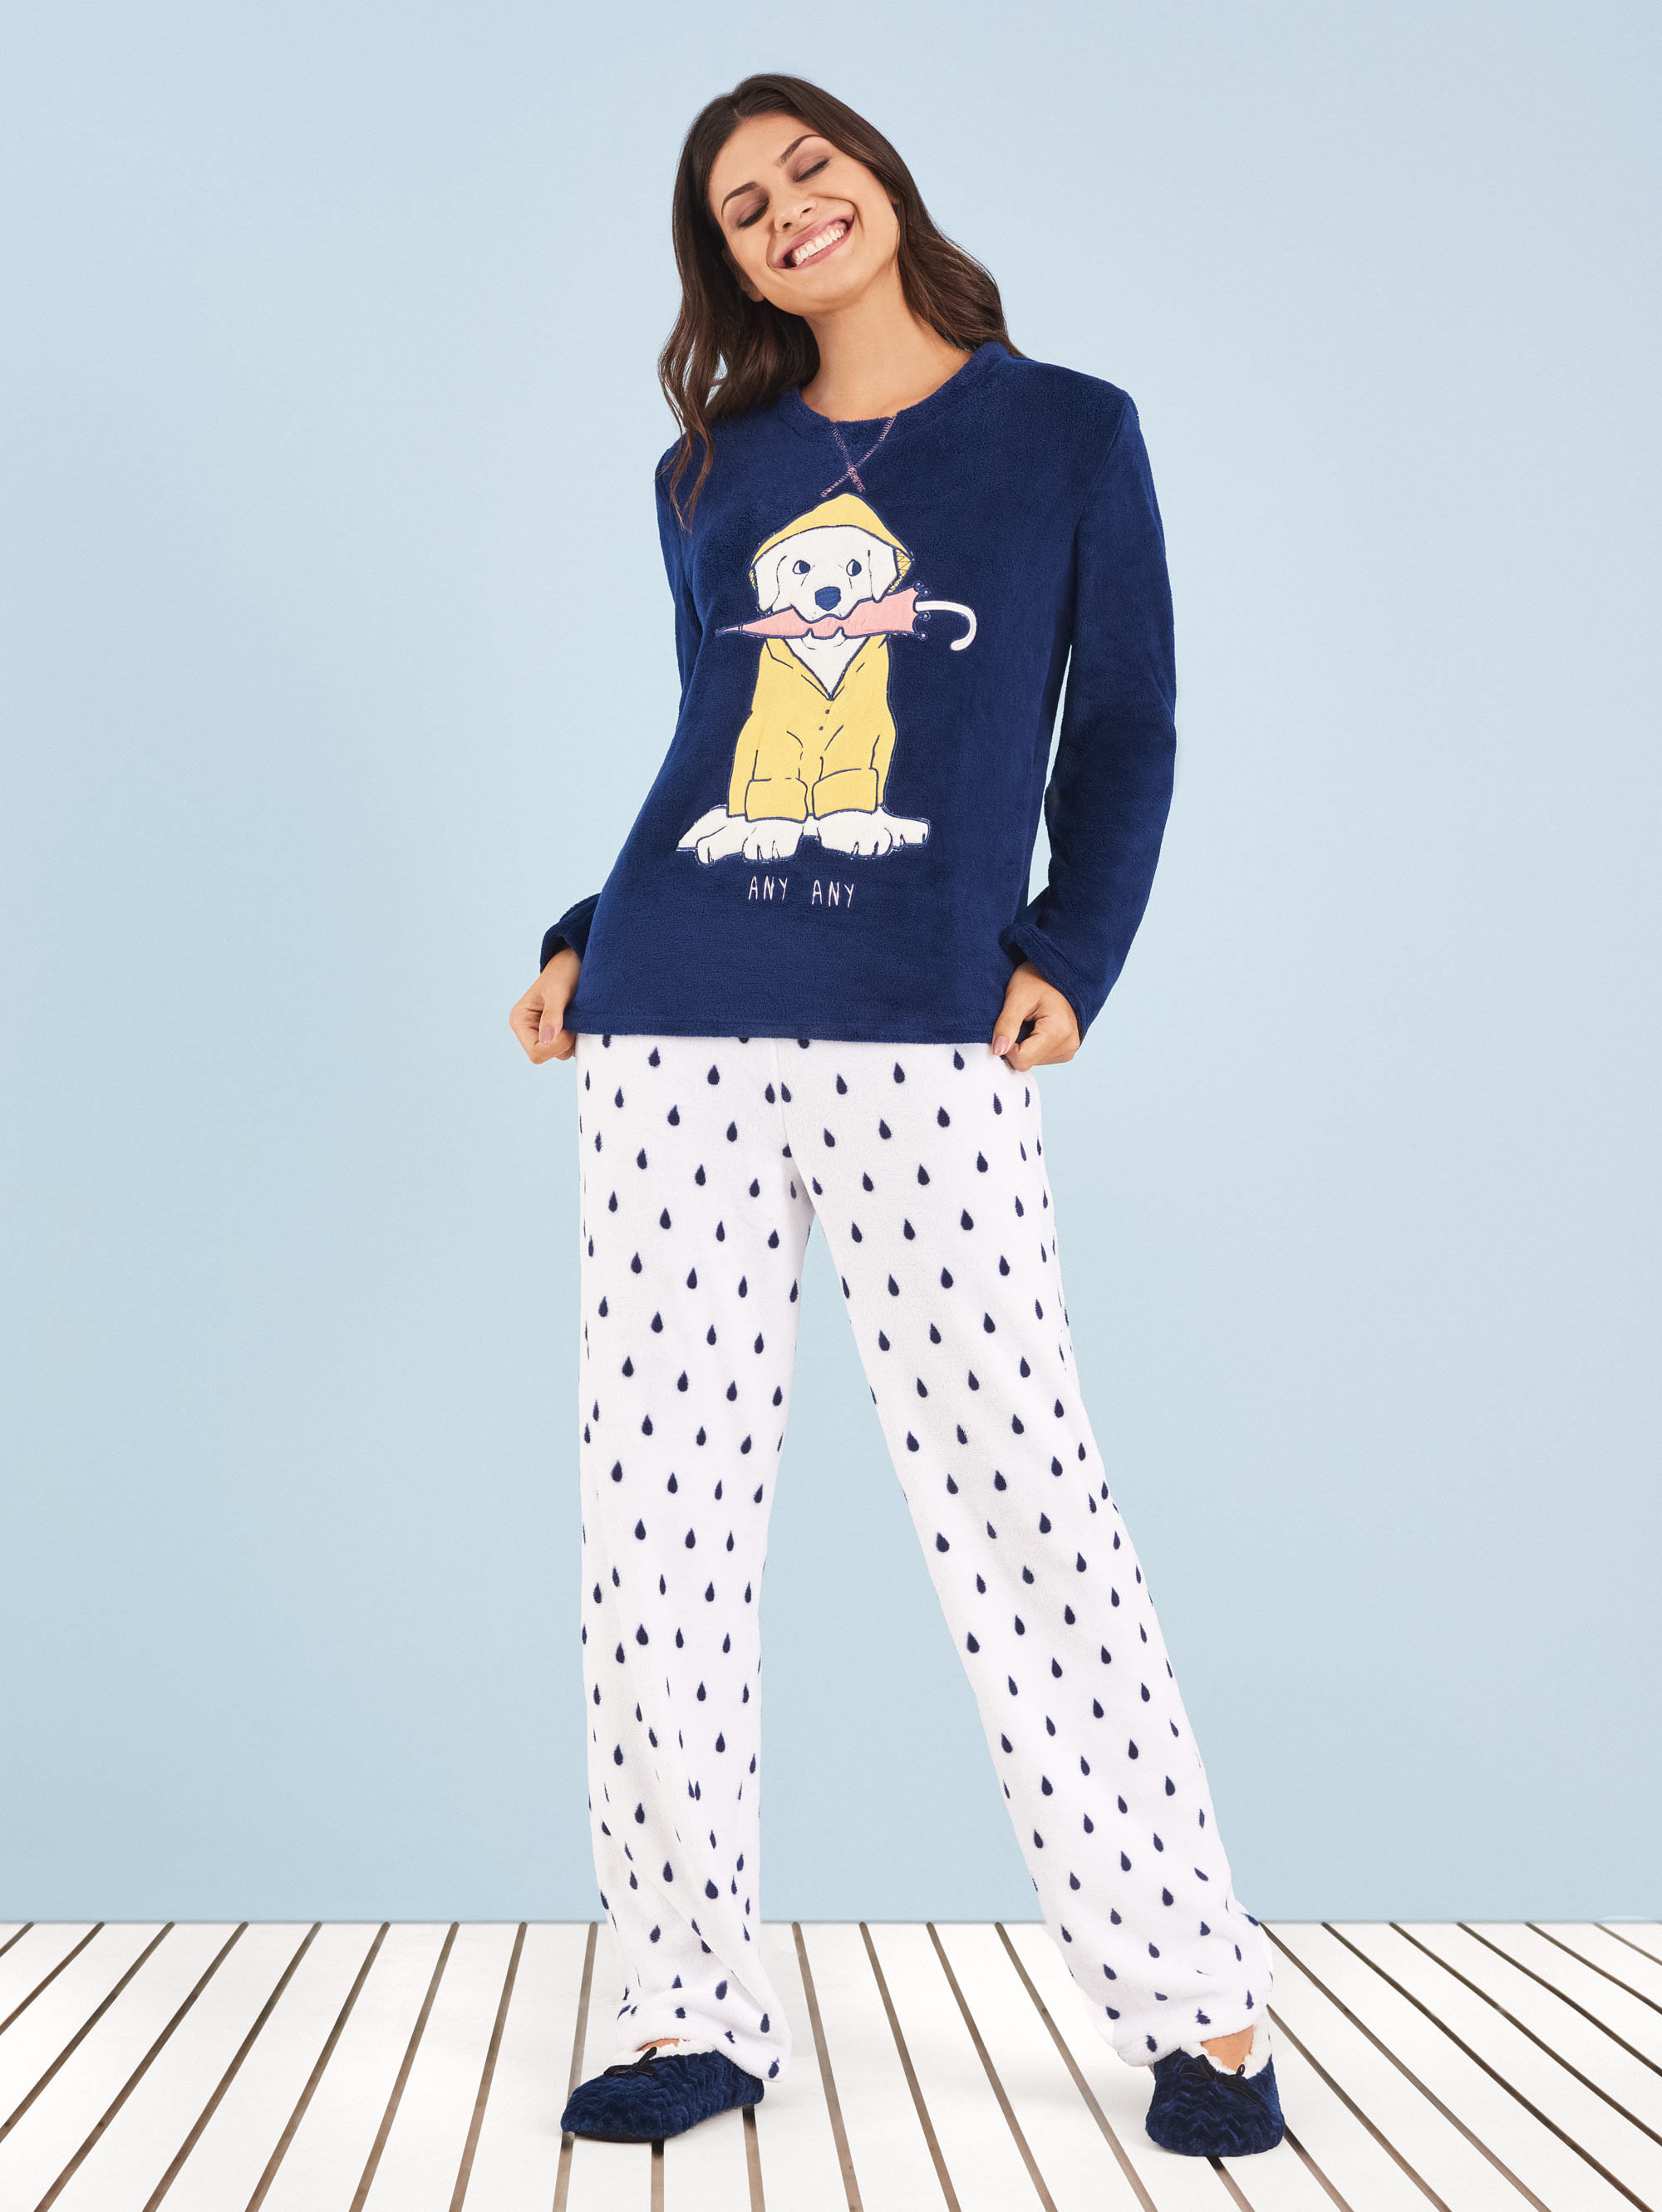 069813a00c pijama-manga-longa-soft-golden-chuva-any-any